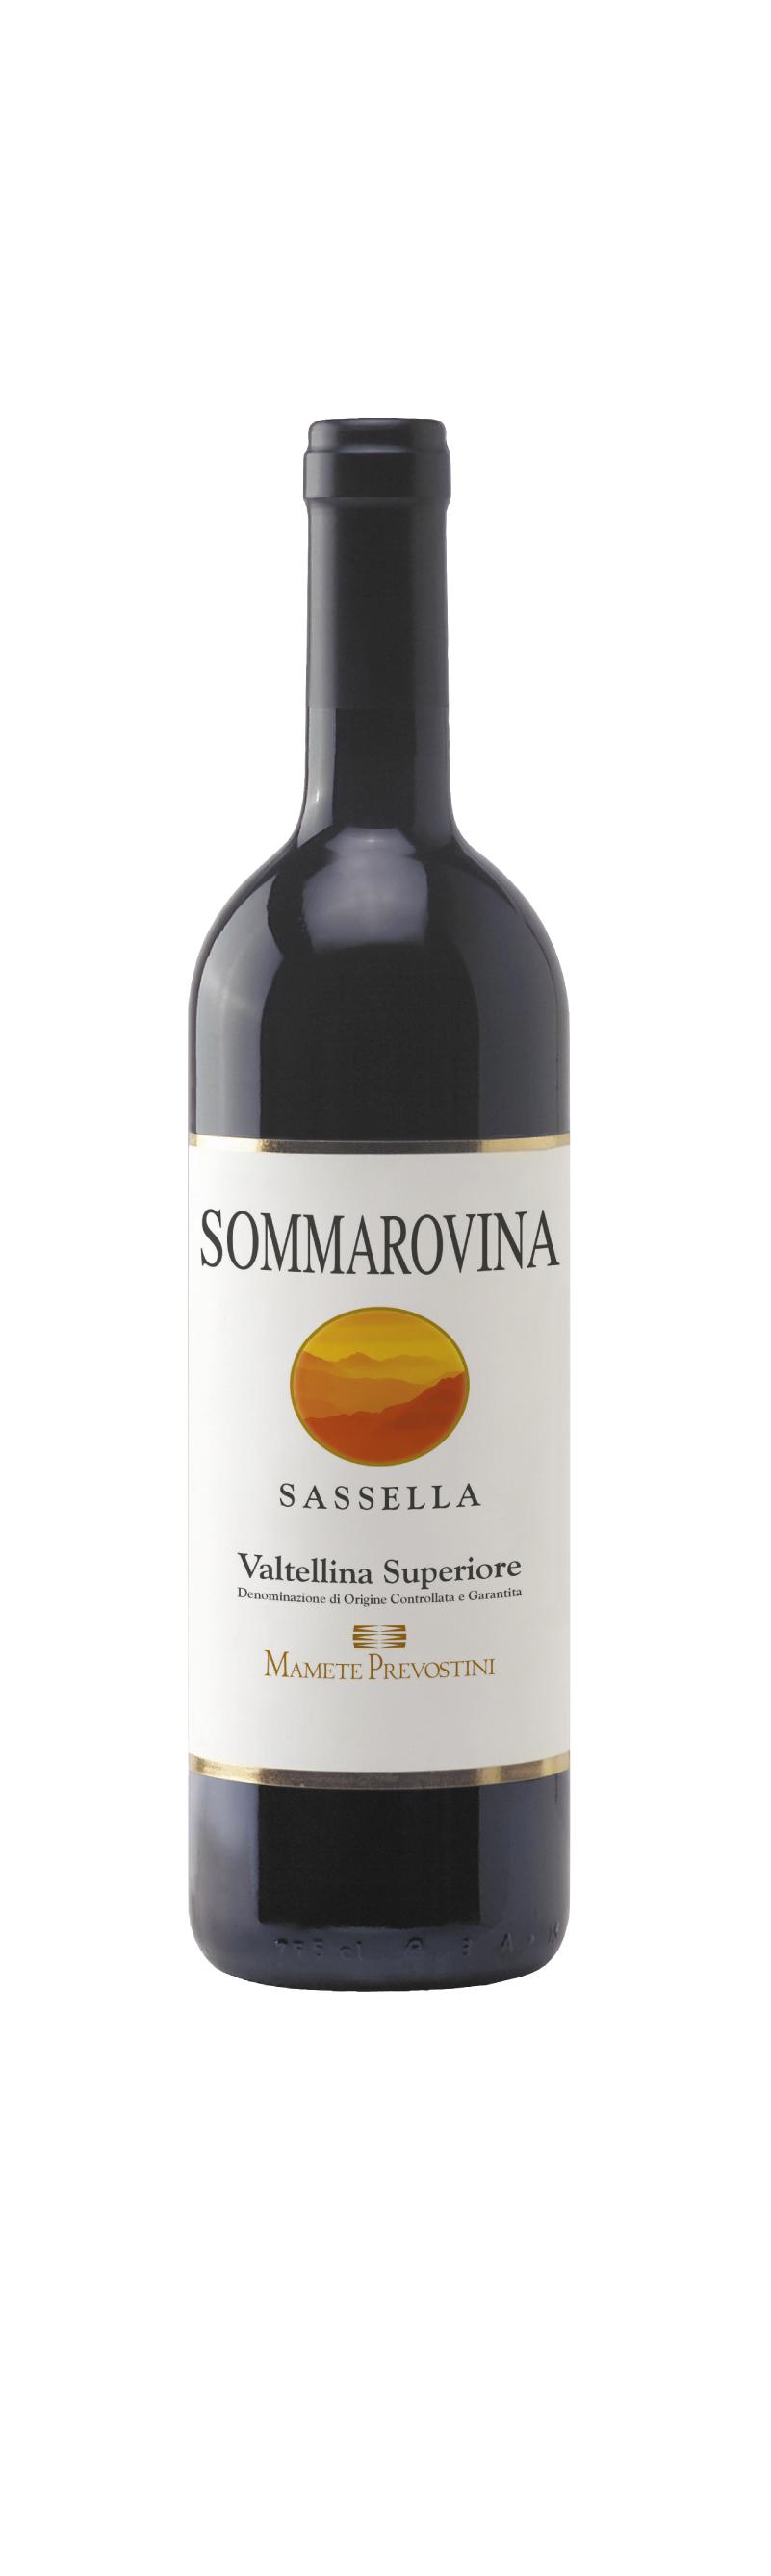 Sommarovina Sassella Valtellina Superiore Docg